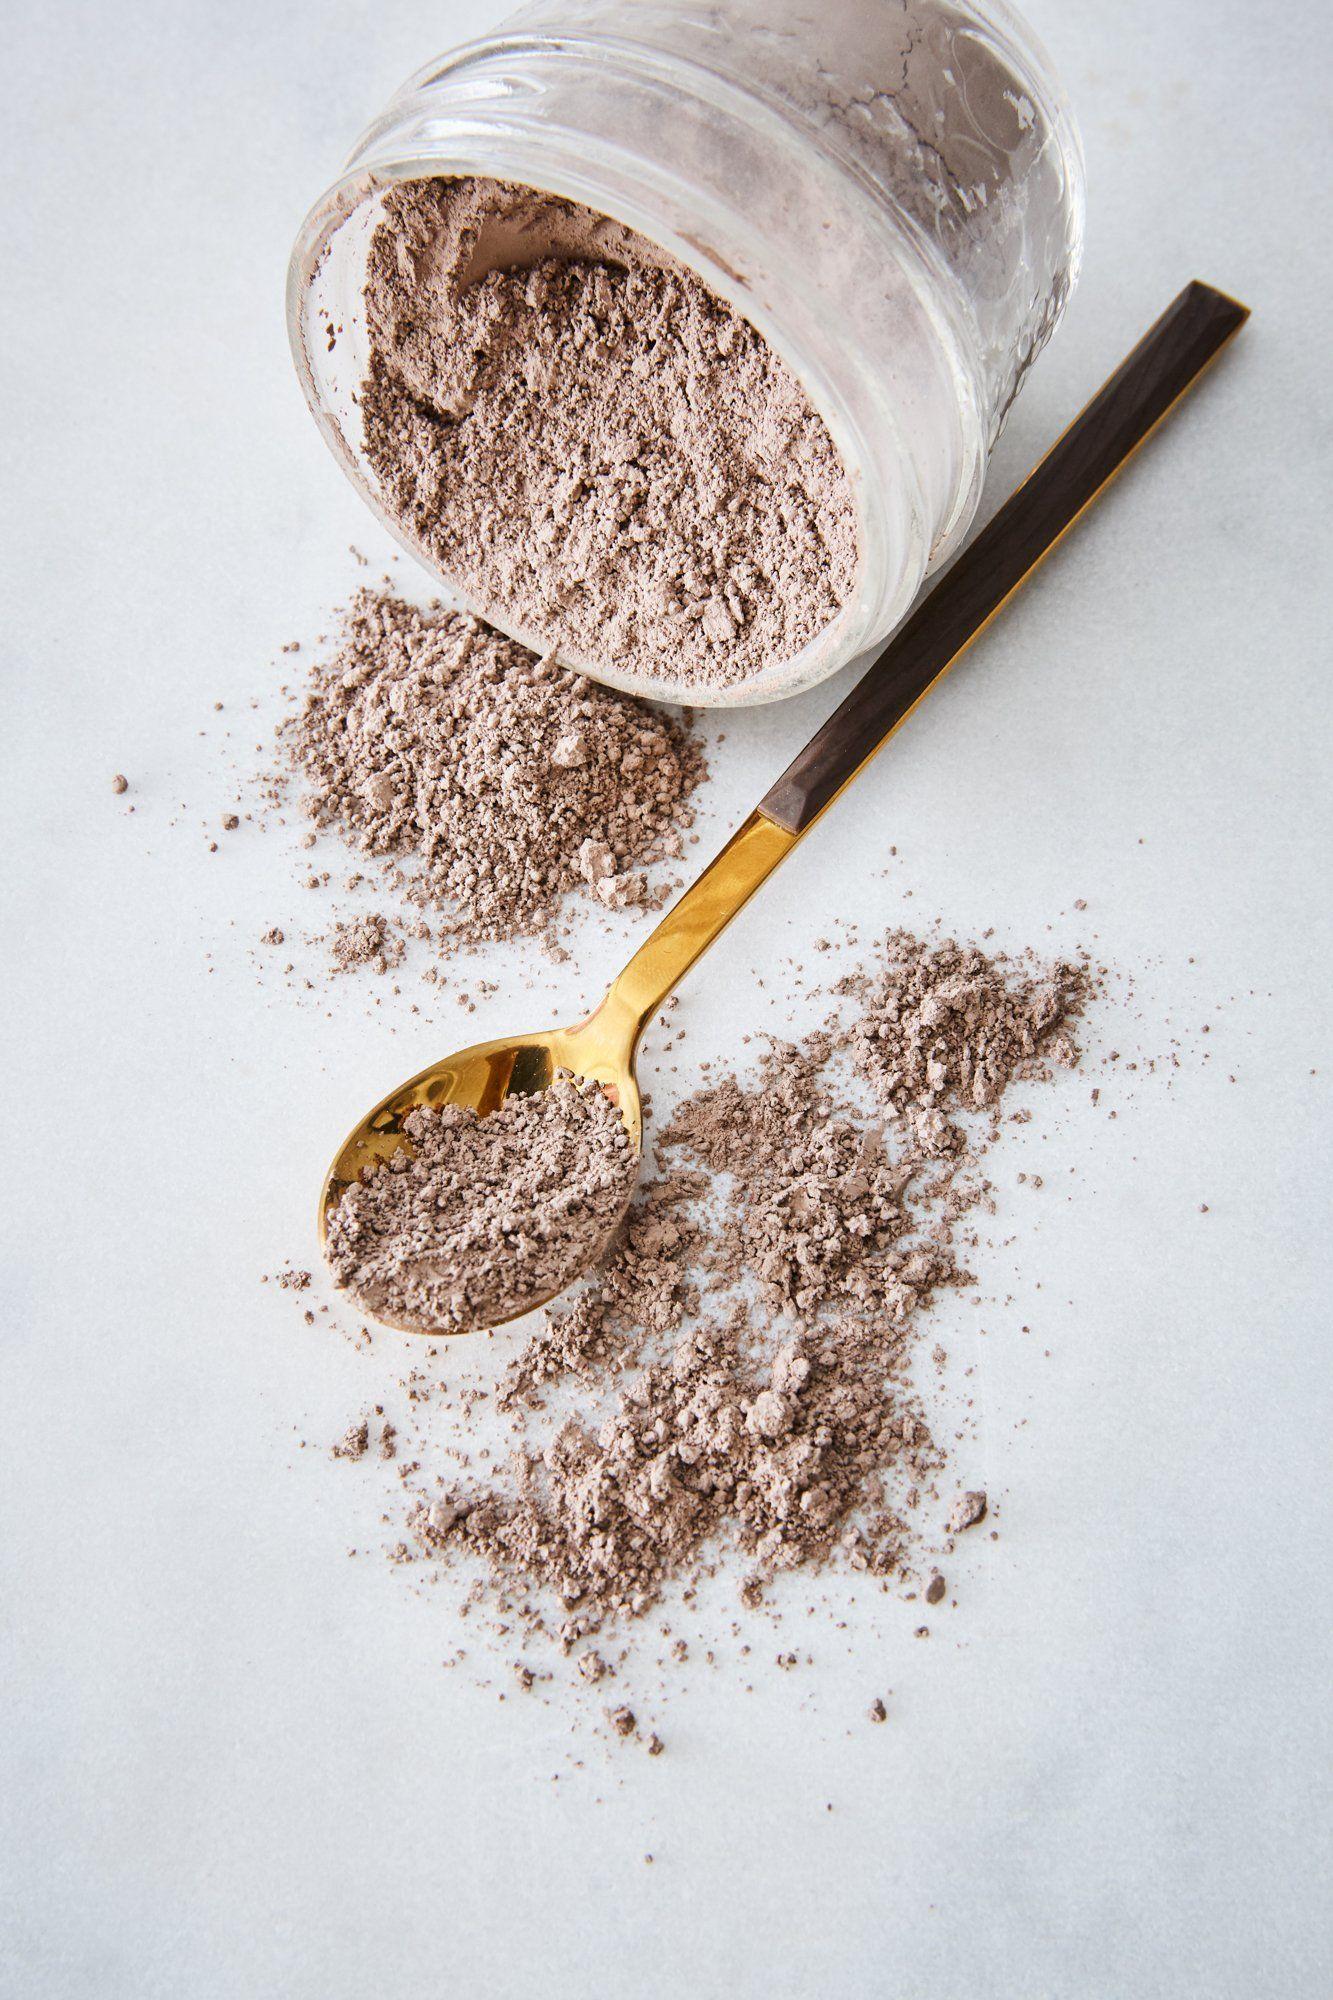 Argile grise Kamouraska – 300 g – sac compostable   – Products